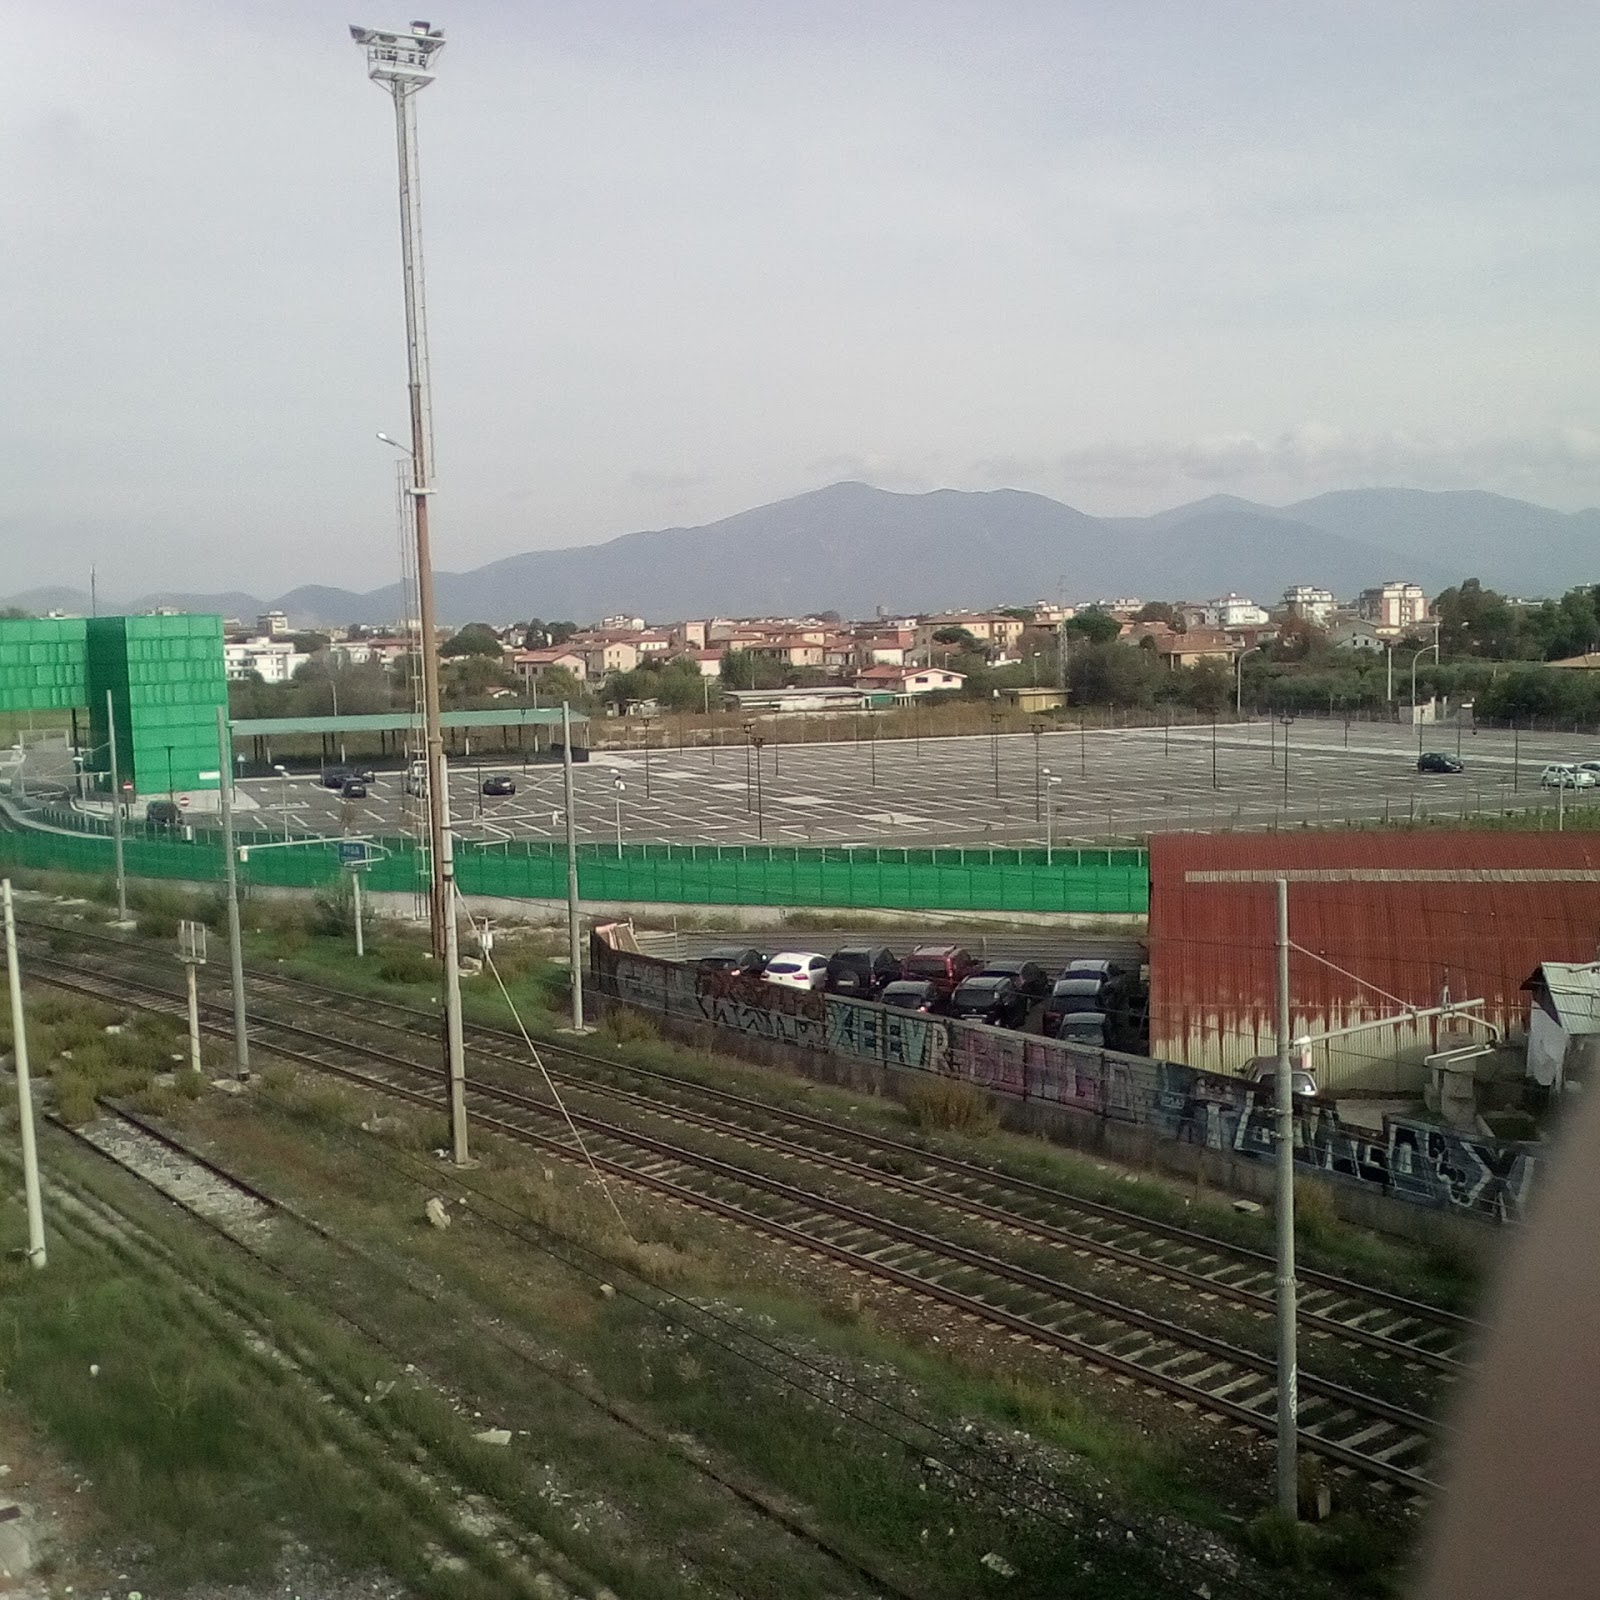 Aeroporto Pisa : Pisa ostelli a pisa ostellidellagioventu